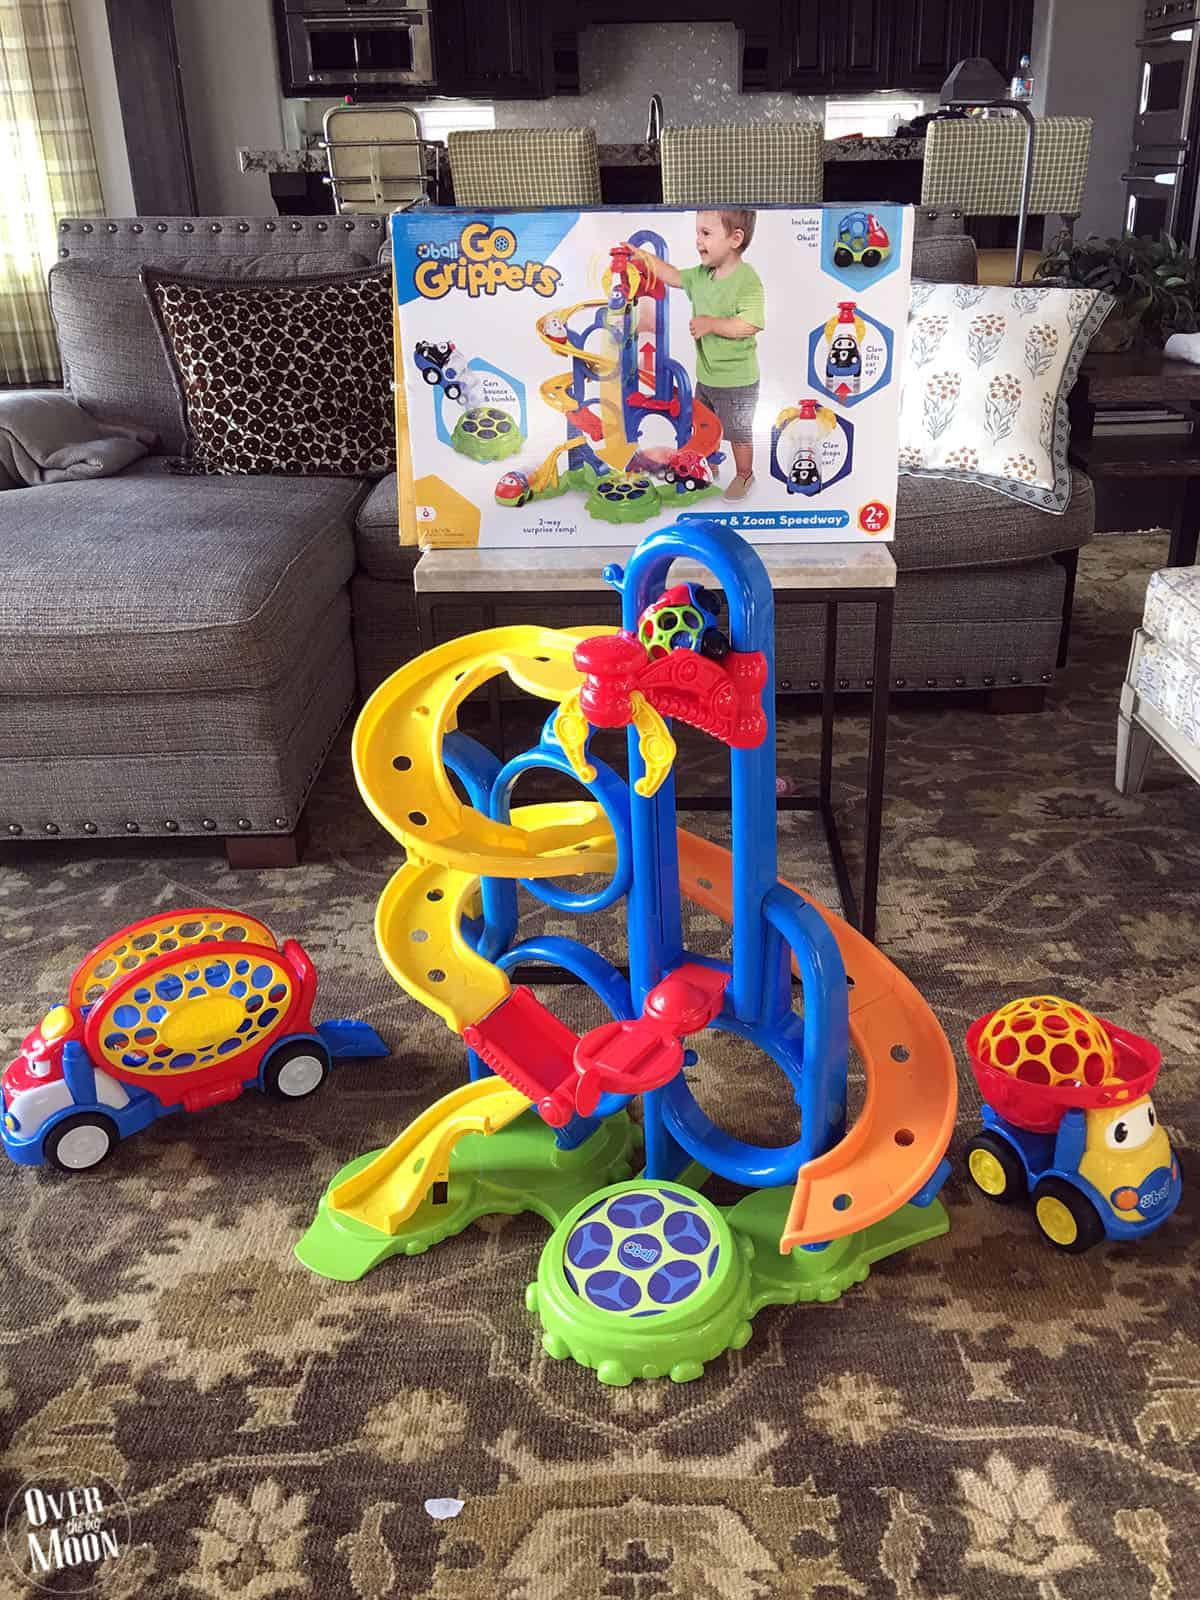 Little Boys Toys Border : Cars themed reward chart over the big moon